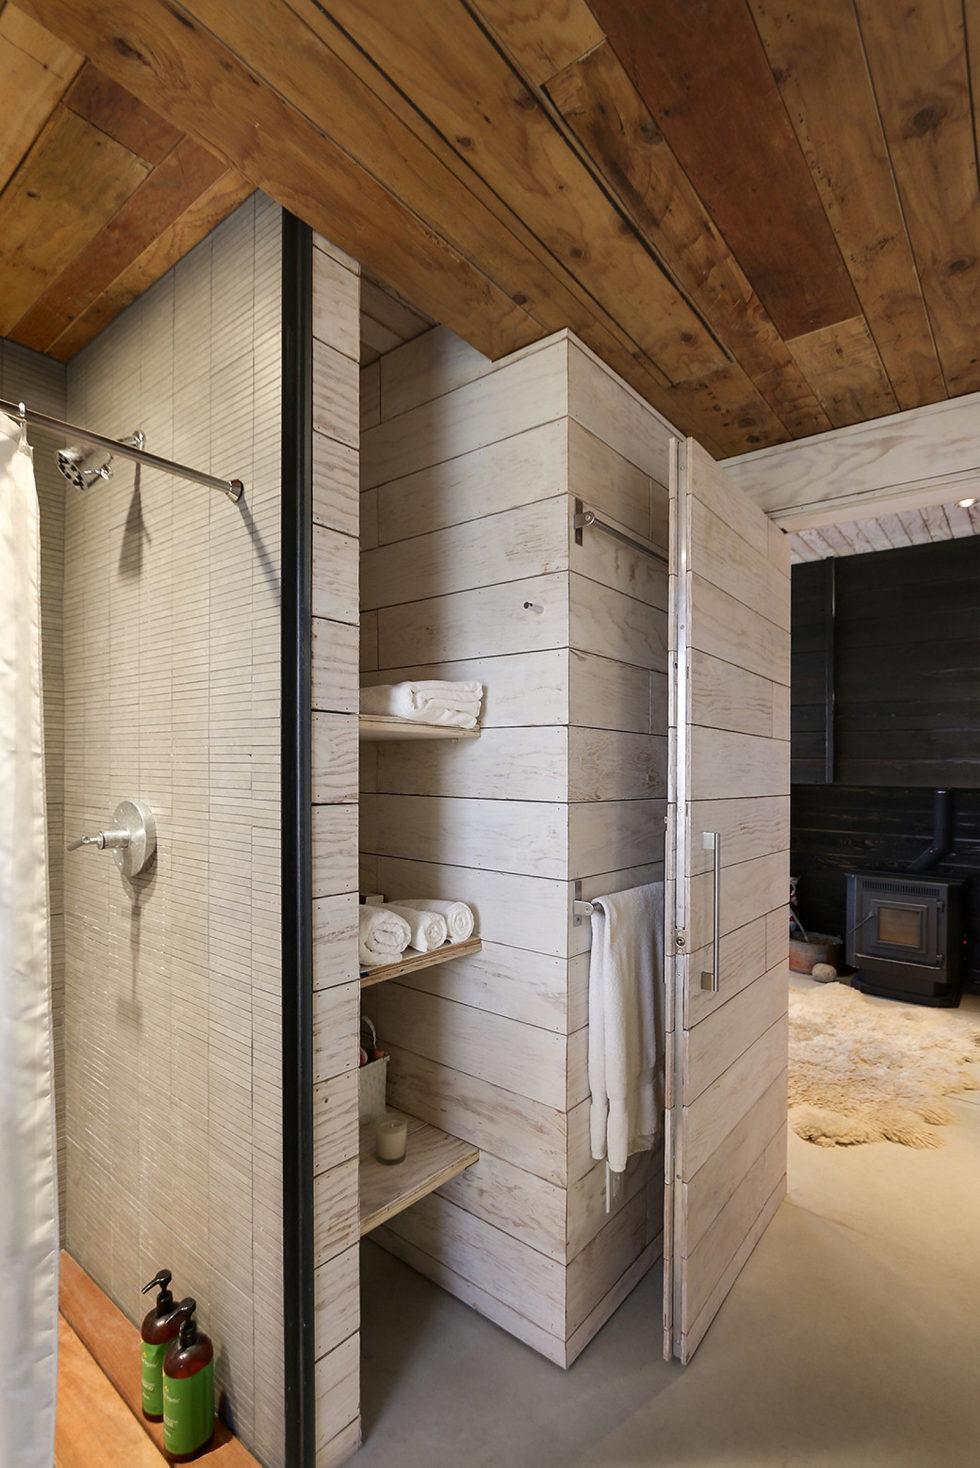 510 Cabin The Country House From Hunter Leggitt Studio In The USA 14